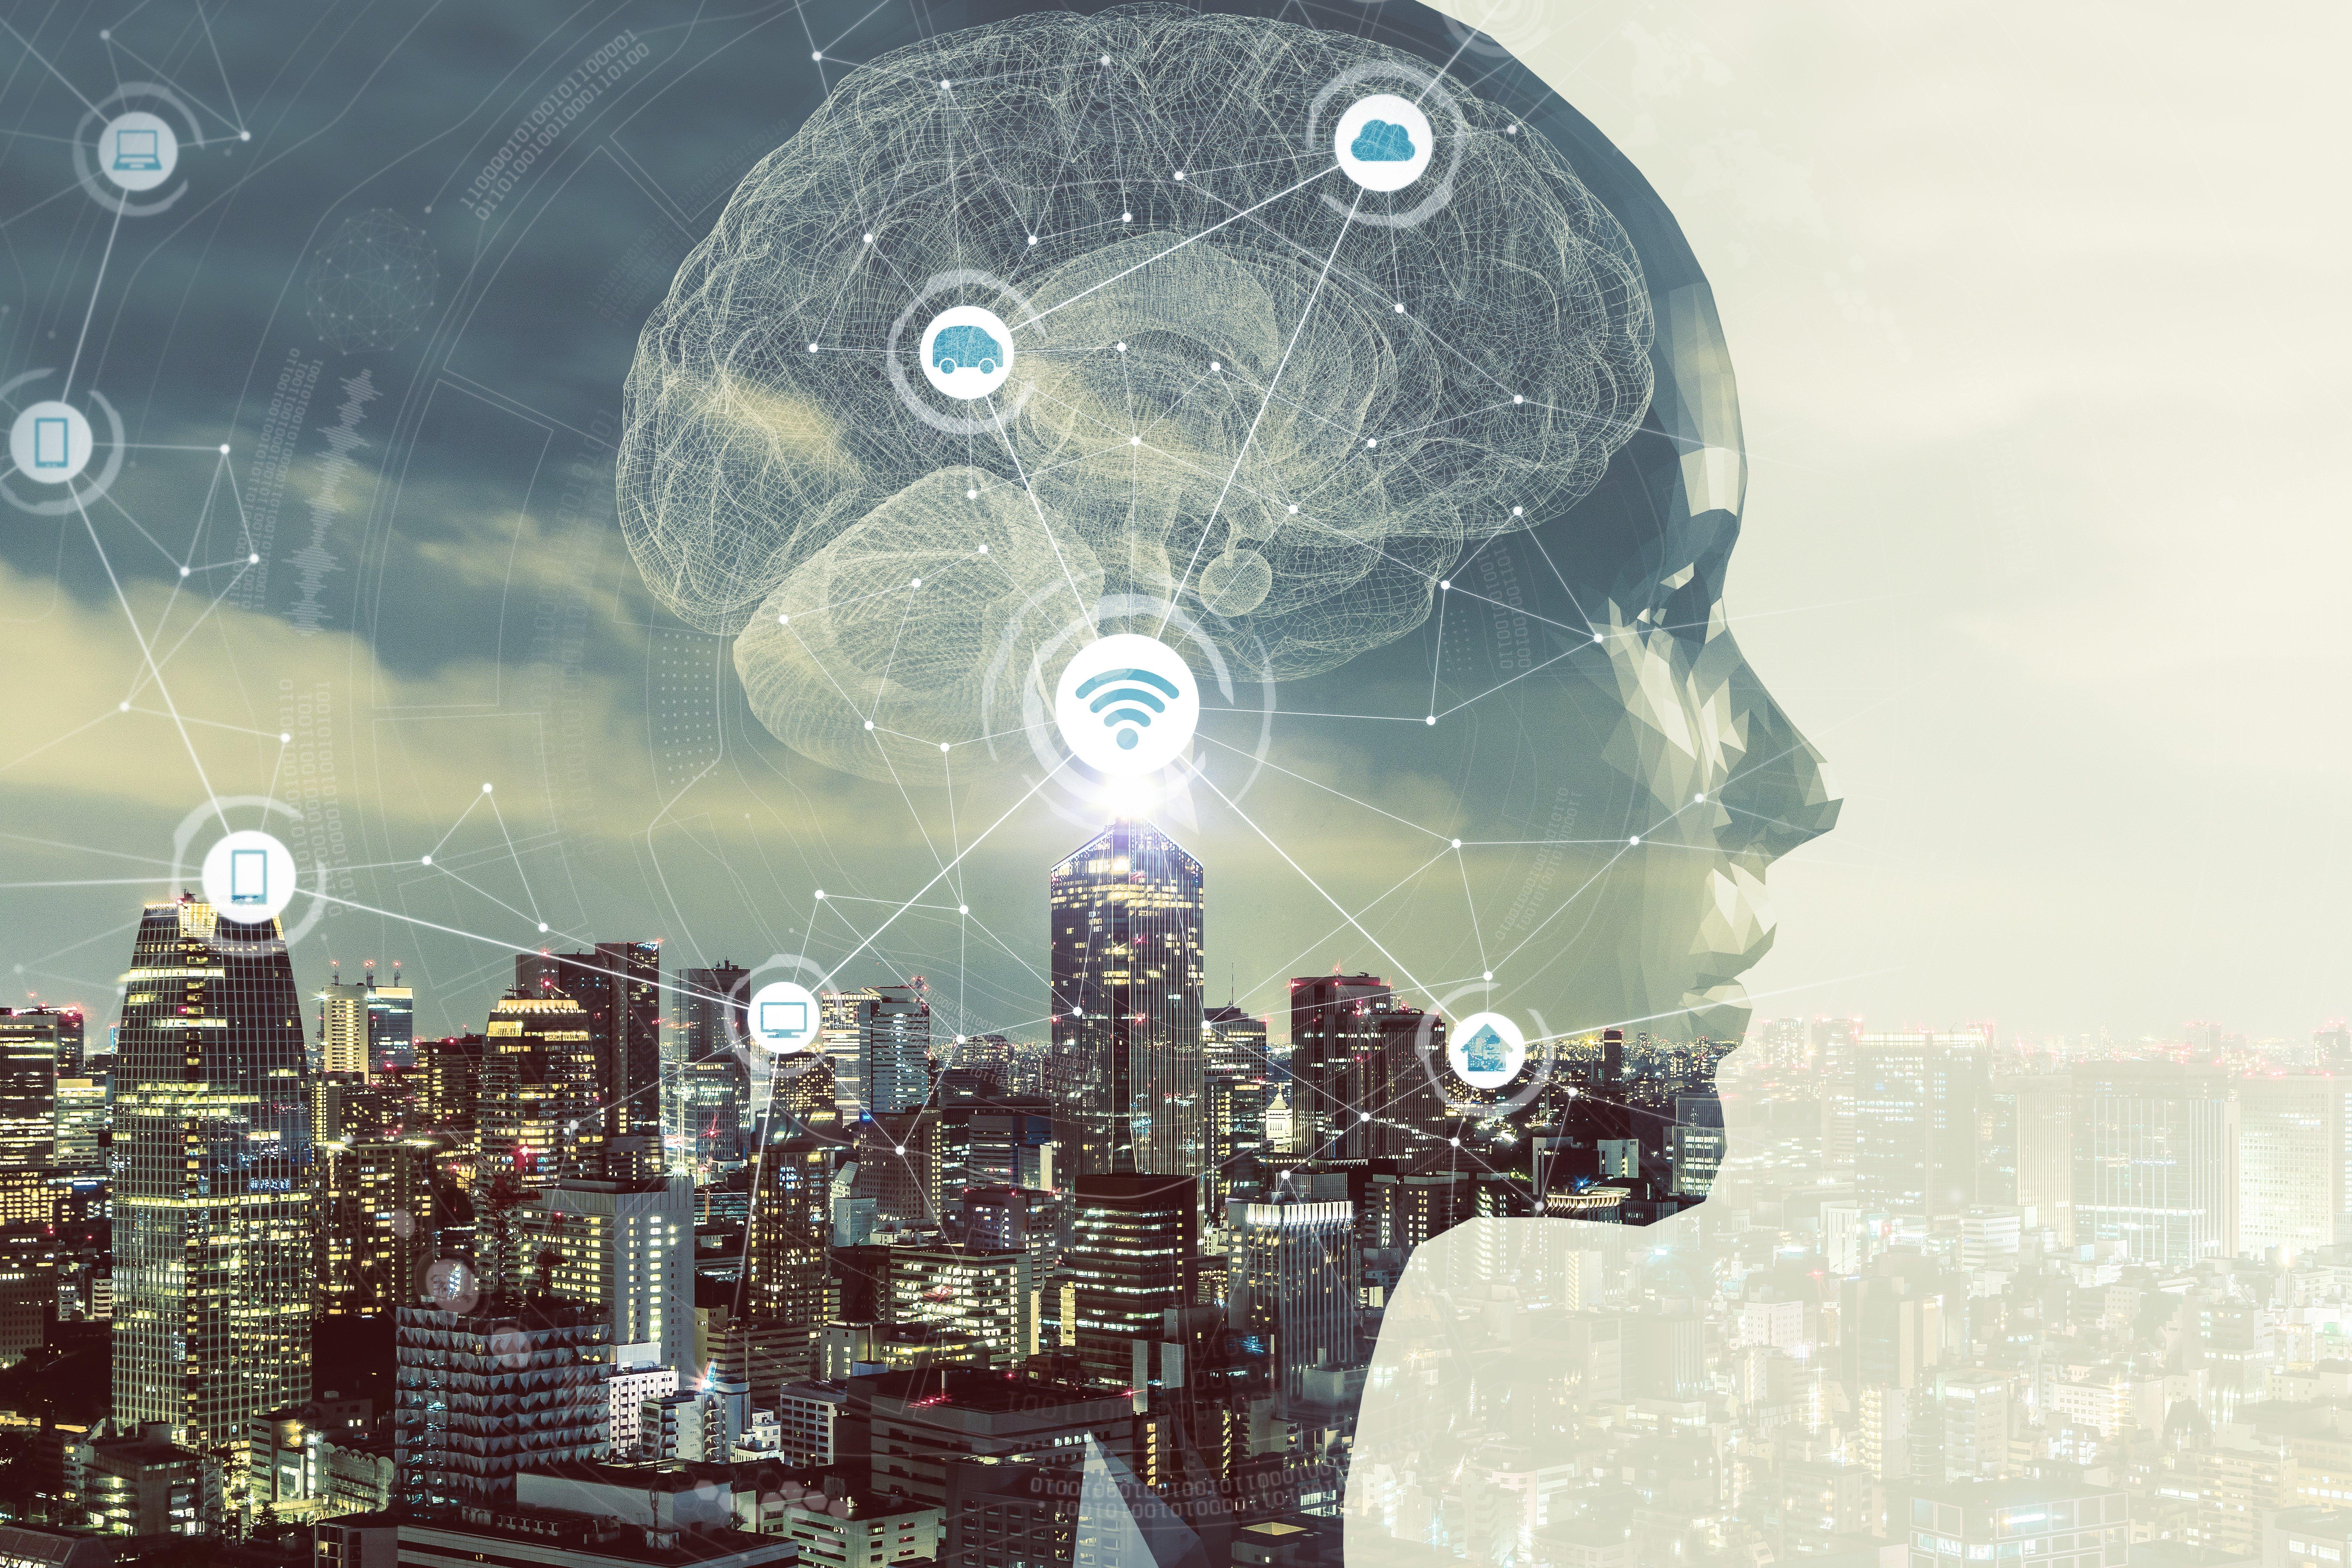 inteligencia artificial-1